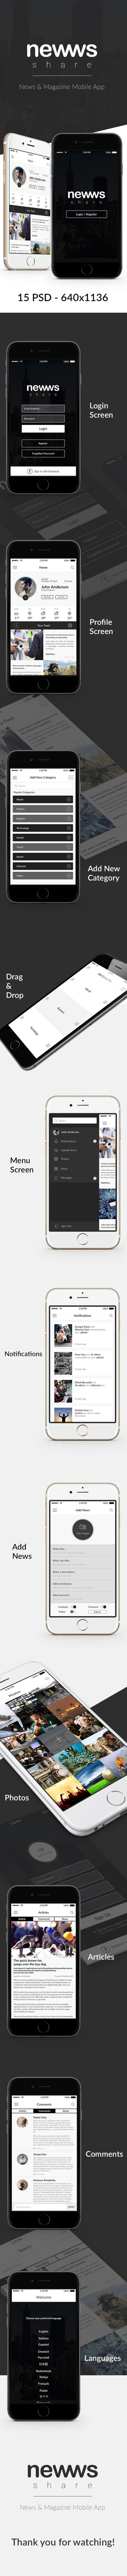 Newws Share News Magazine App UI